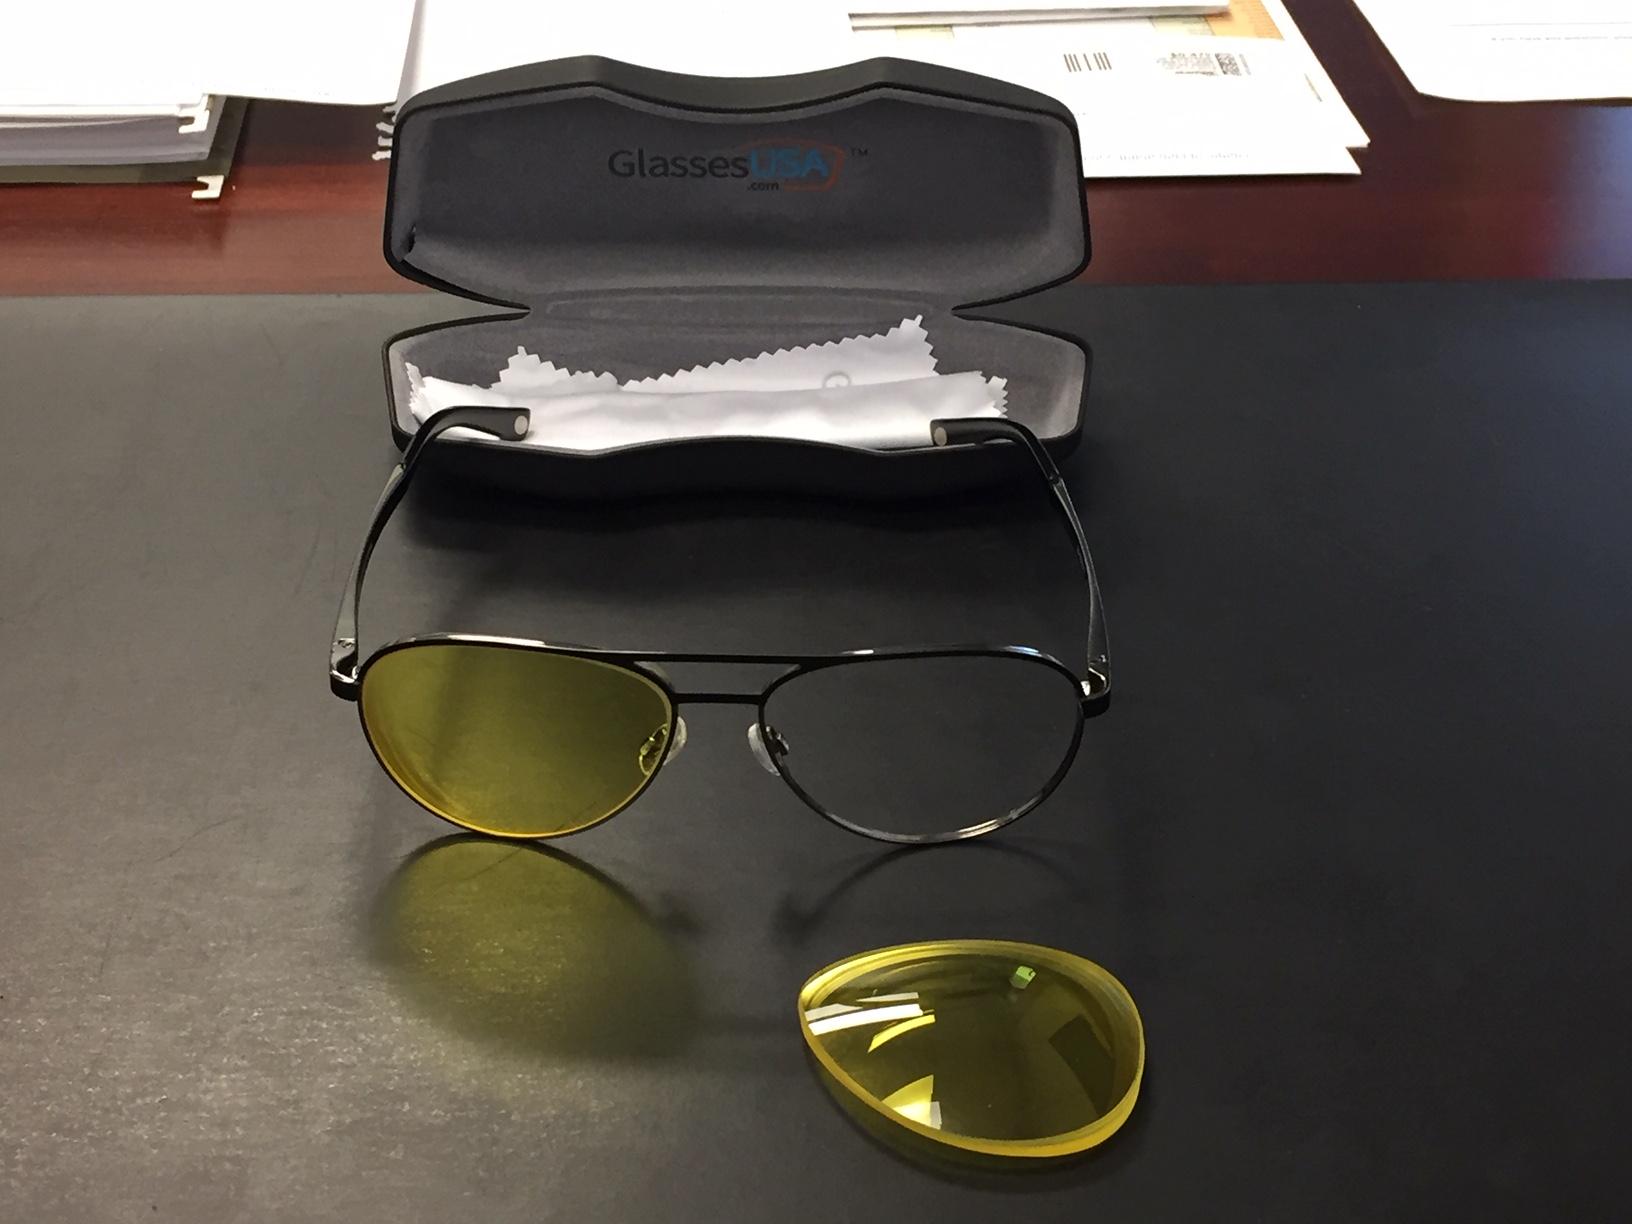 8aabcd3aeb GlassesUSA Reviews - 2